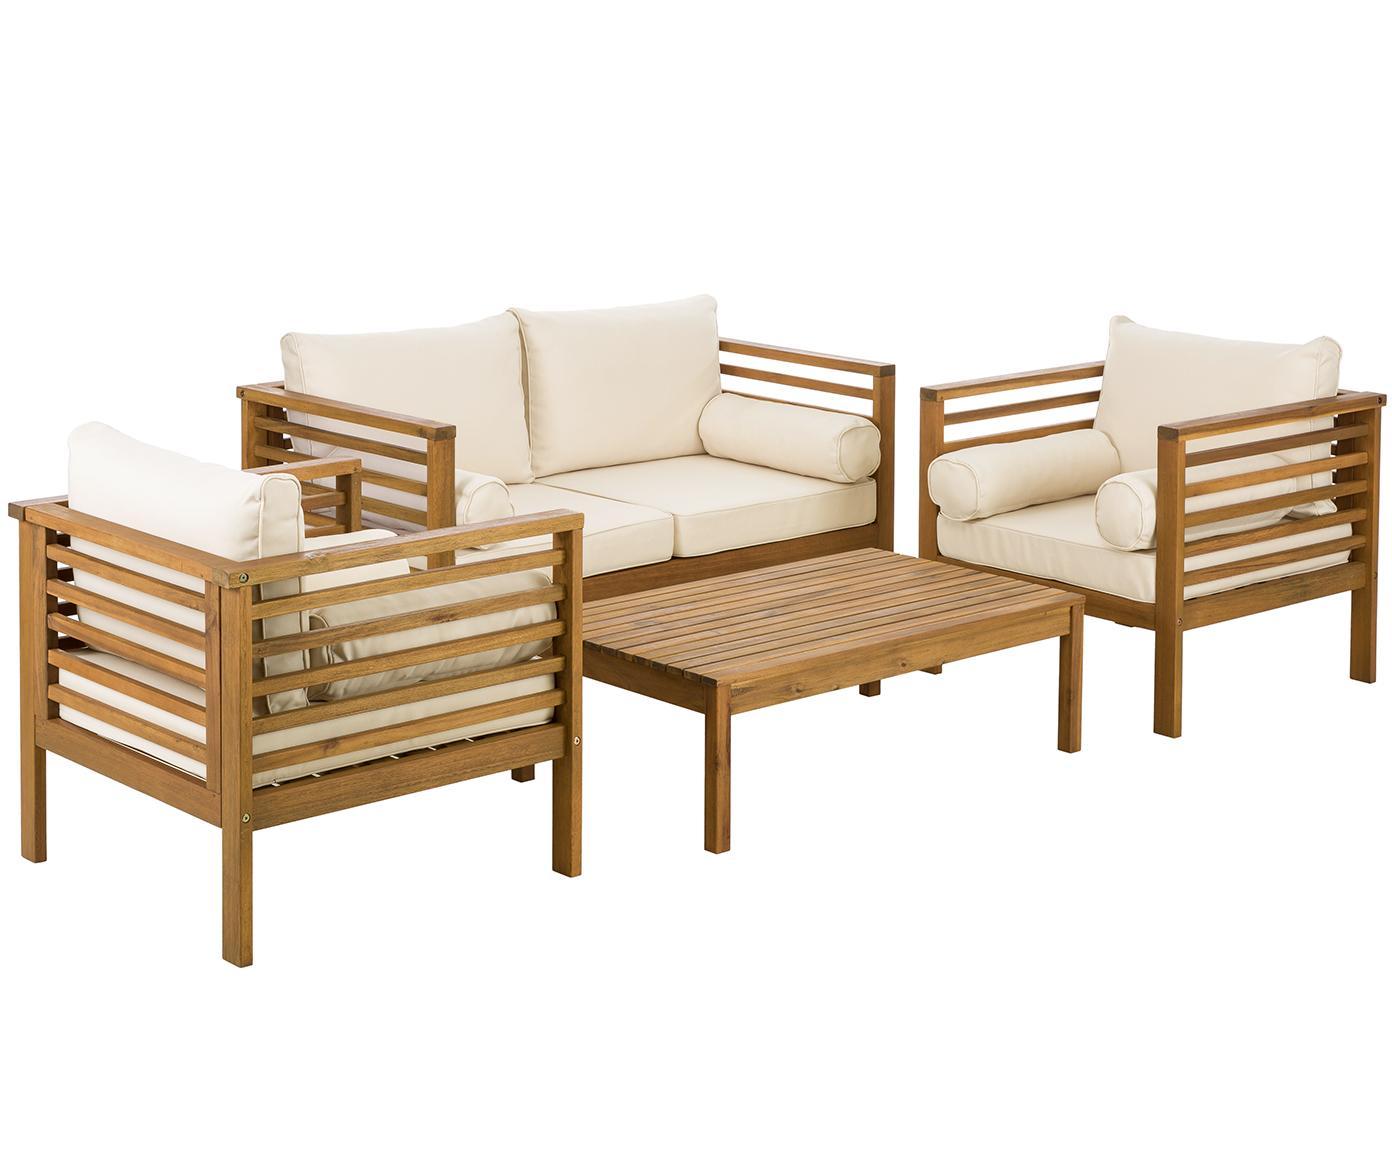 Set lounge de exterior Bo, 4pzas., Tapizado: poliéster, Estructura: madera de acacia maciza a, Beige, acacia, Tamaños diferentes